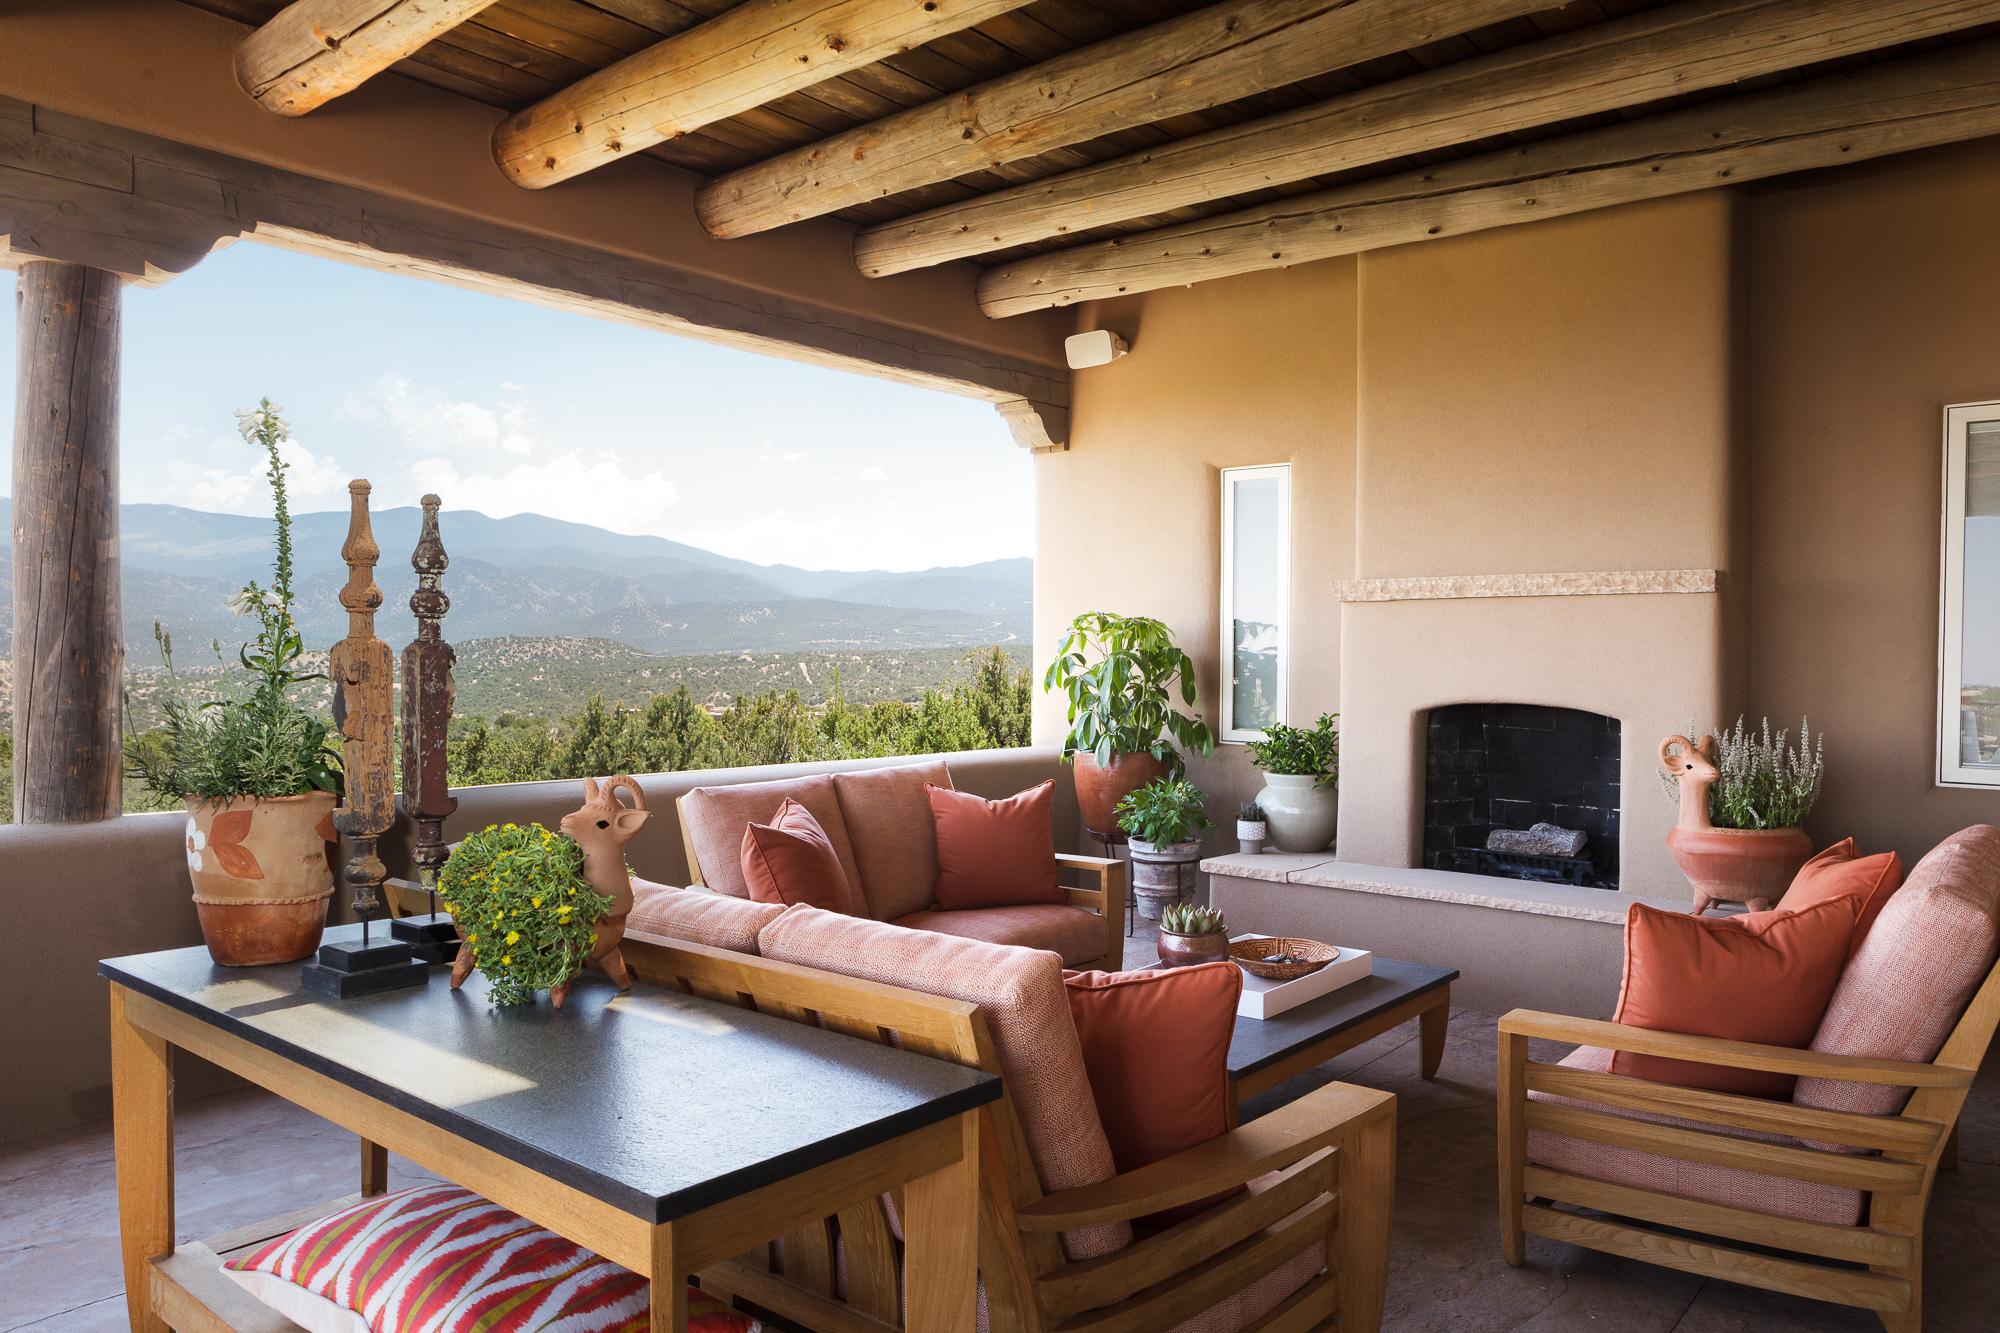 Best interior Designer in Santa Fe